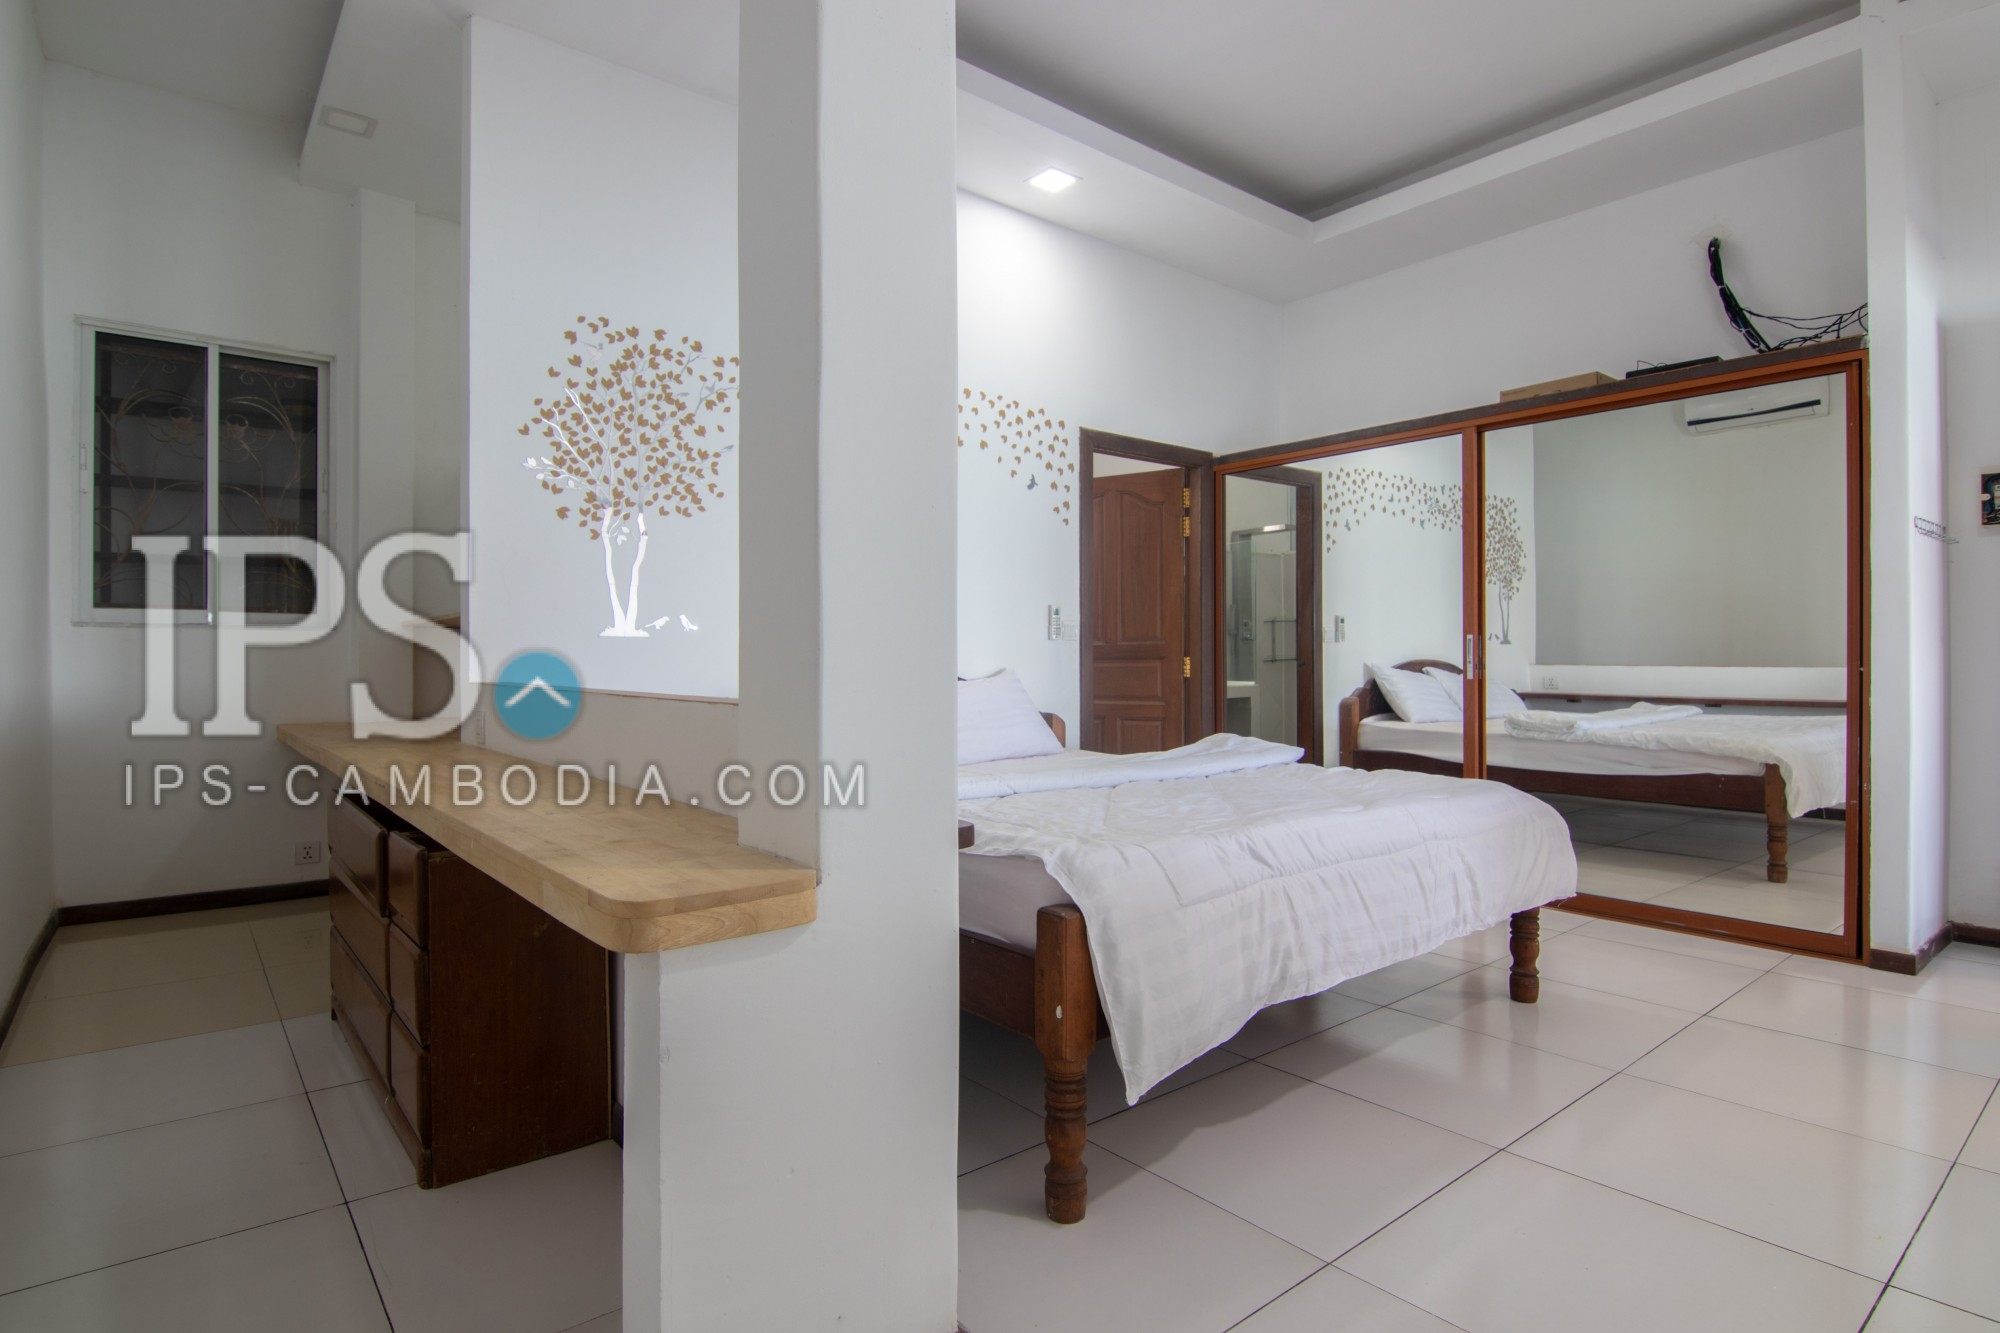 4 Bedroom Apartment For Rent - Chroy Chongva, Phnom Penh